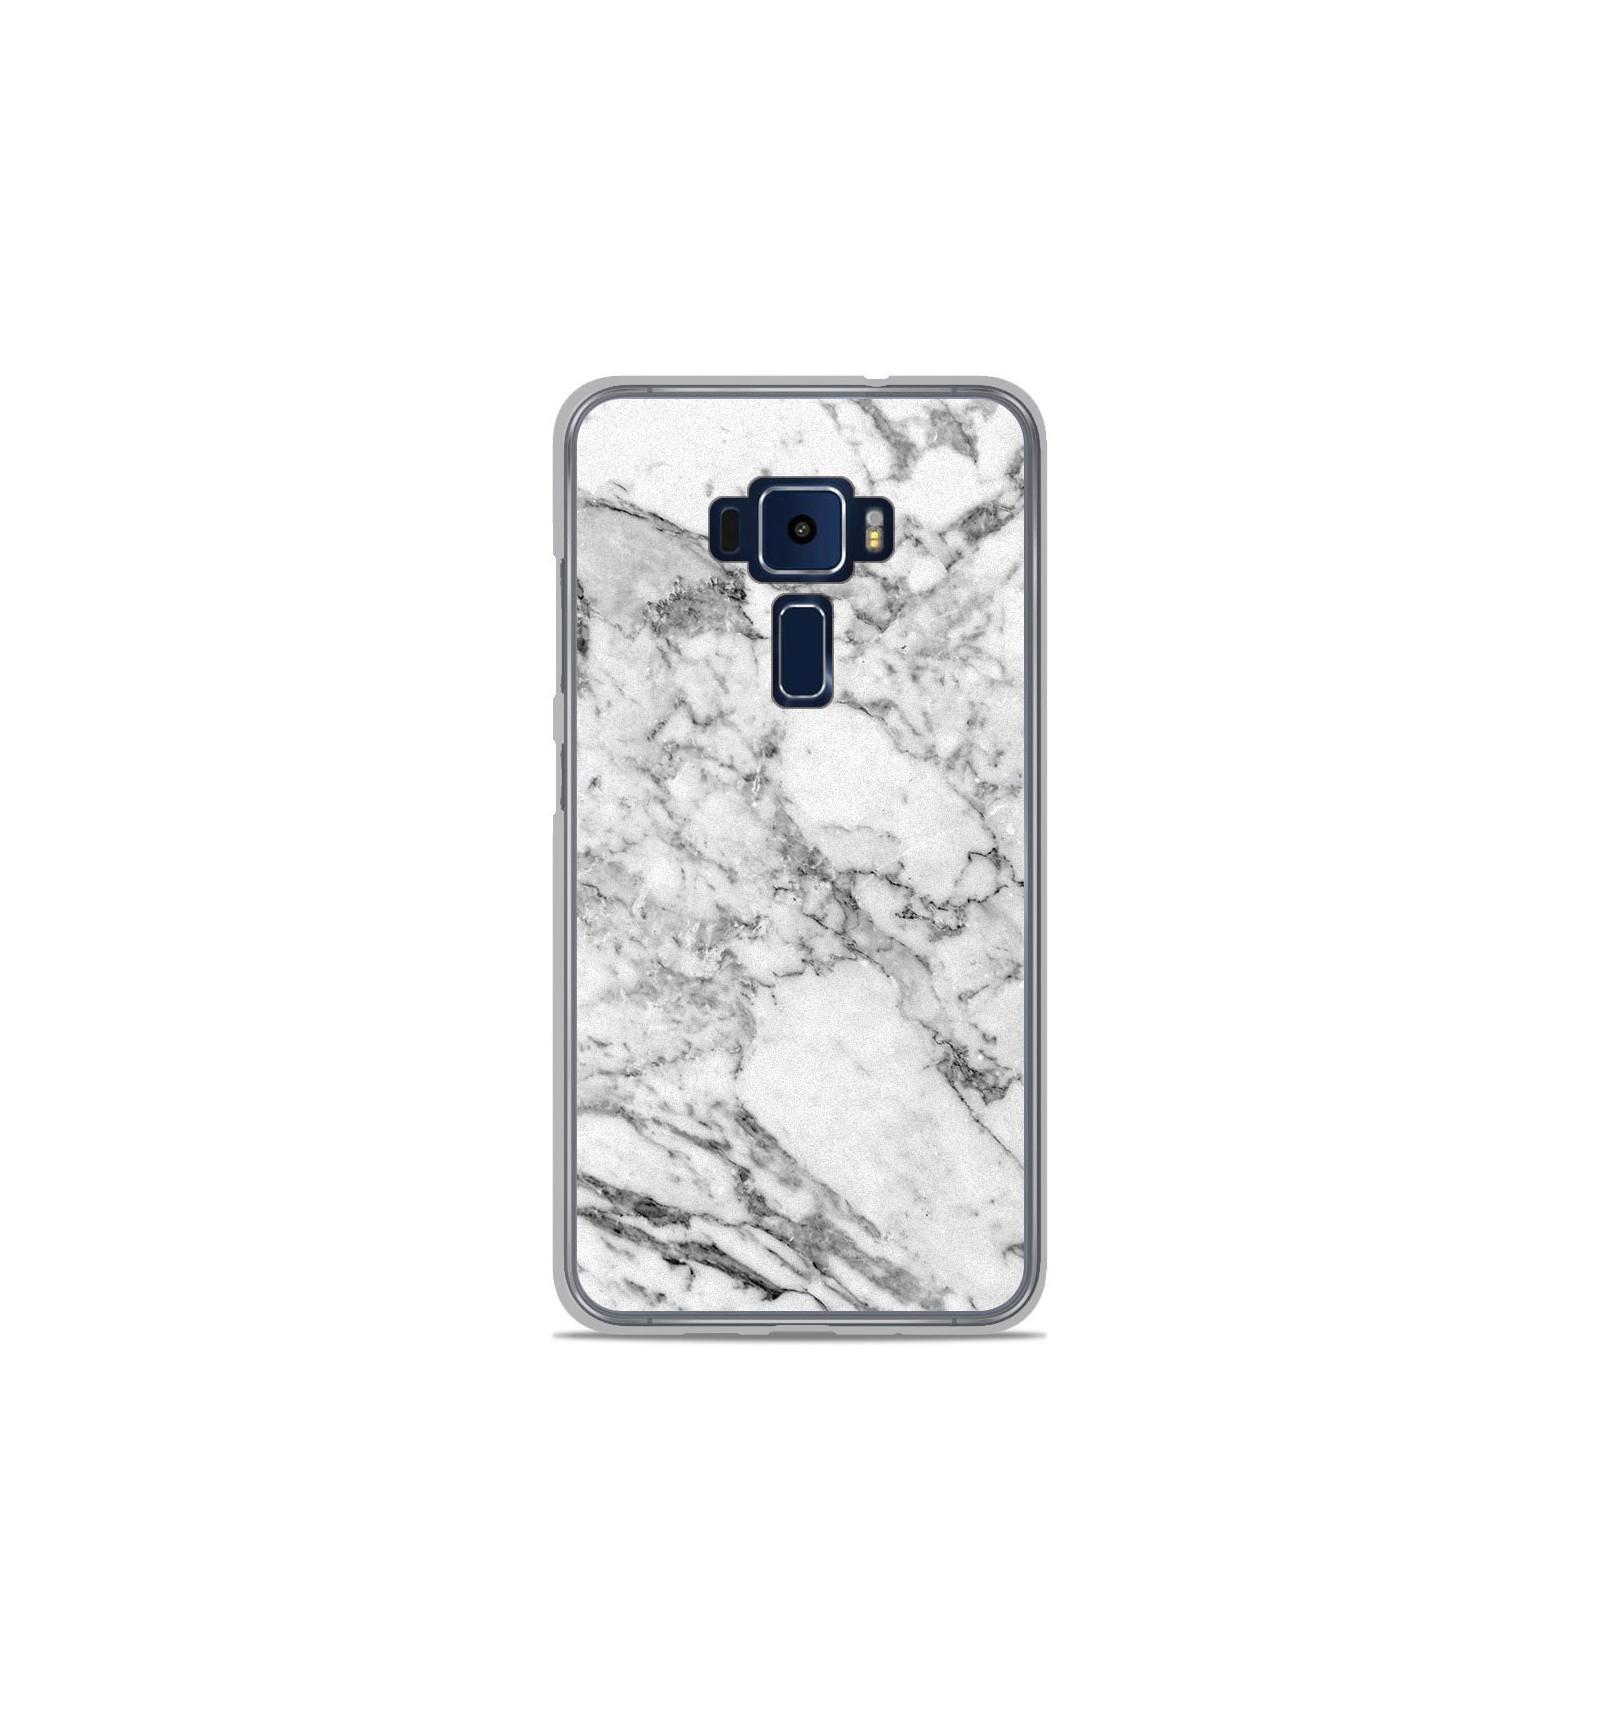 coque en silicone asus zenfone 3 ze520kl marbre blanc. Black Bedroom Furniture Sets. Home Design Ideas